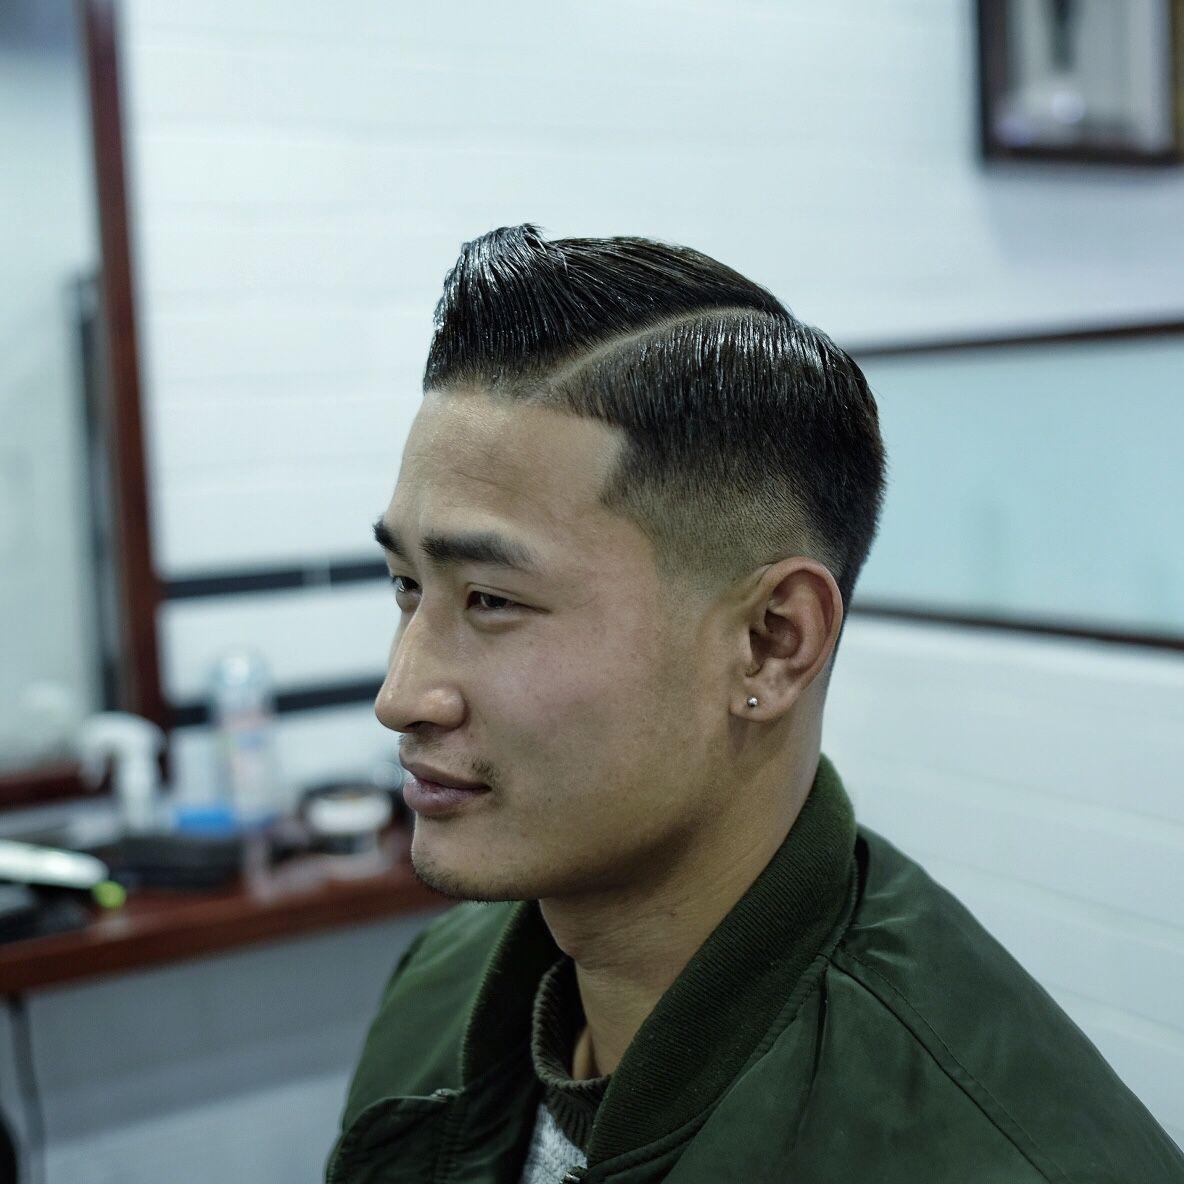 Haircut  Special  Pinterest  Mens hair Haircuts and Hair style